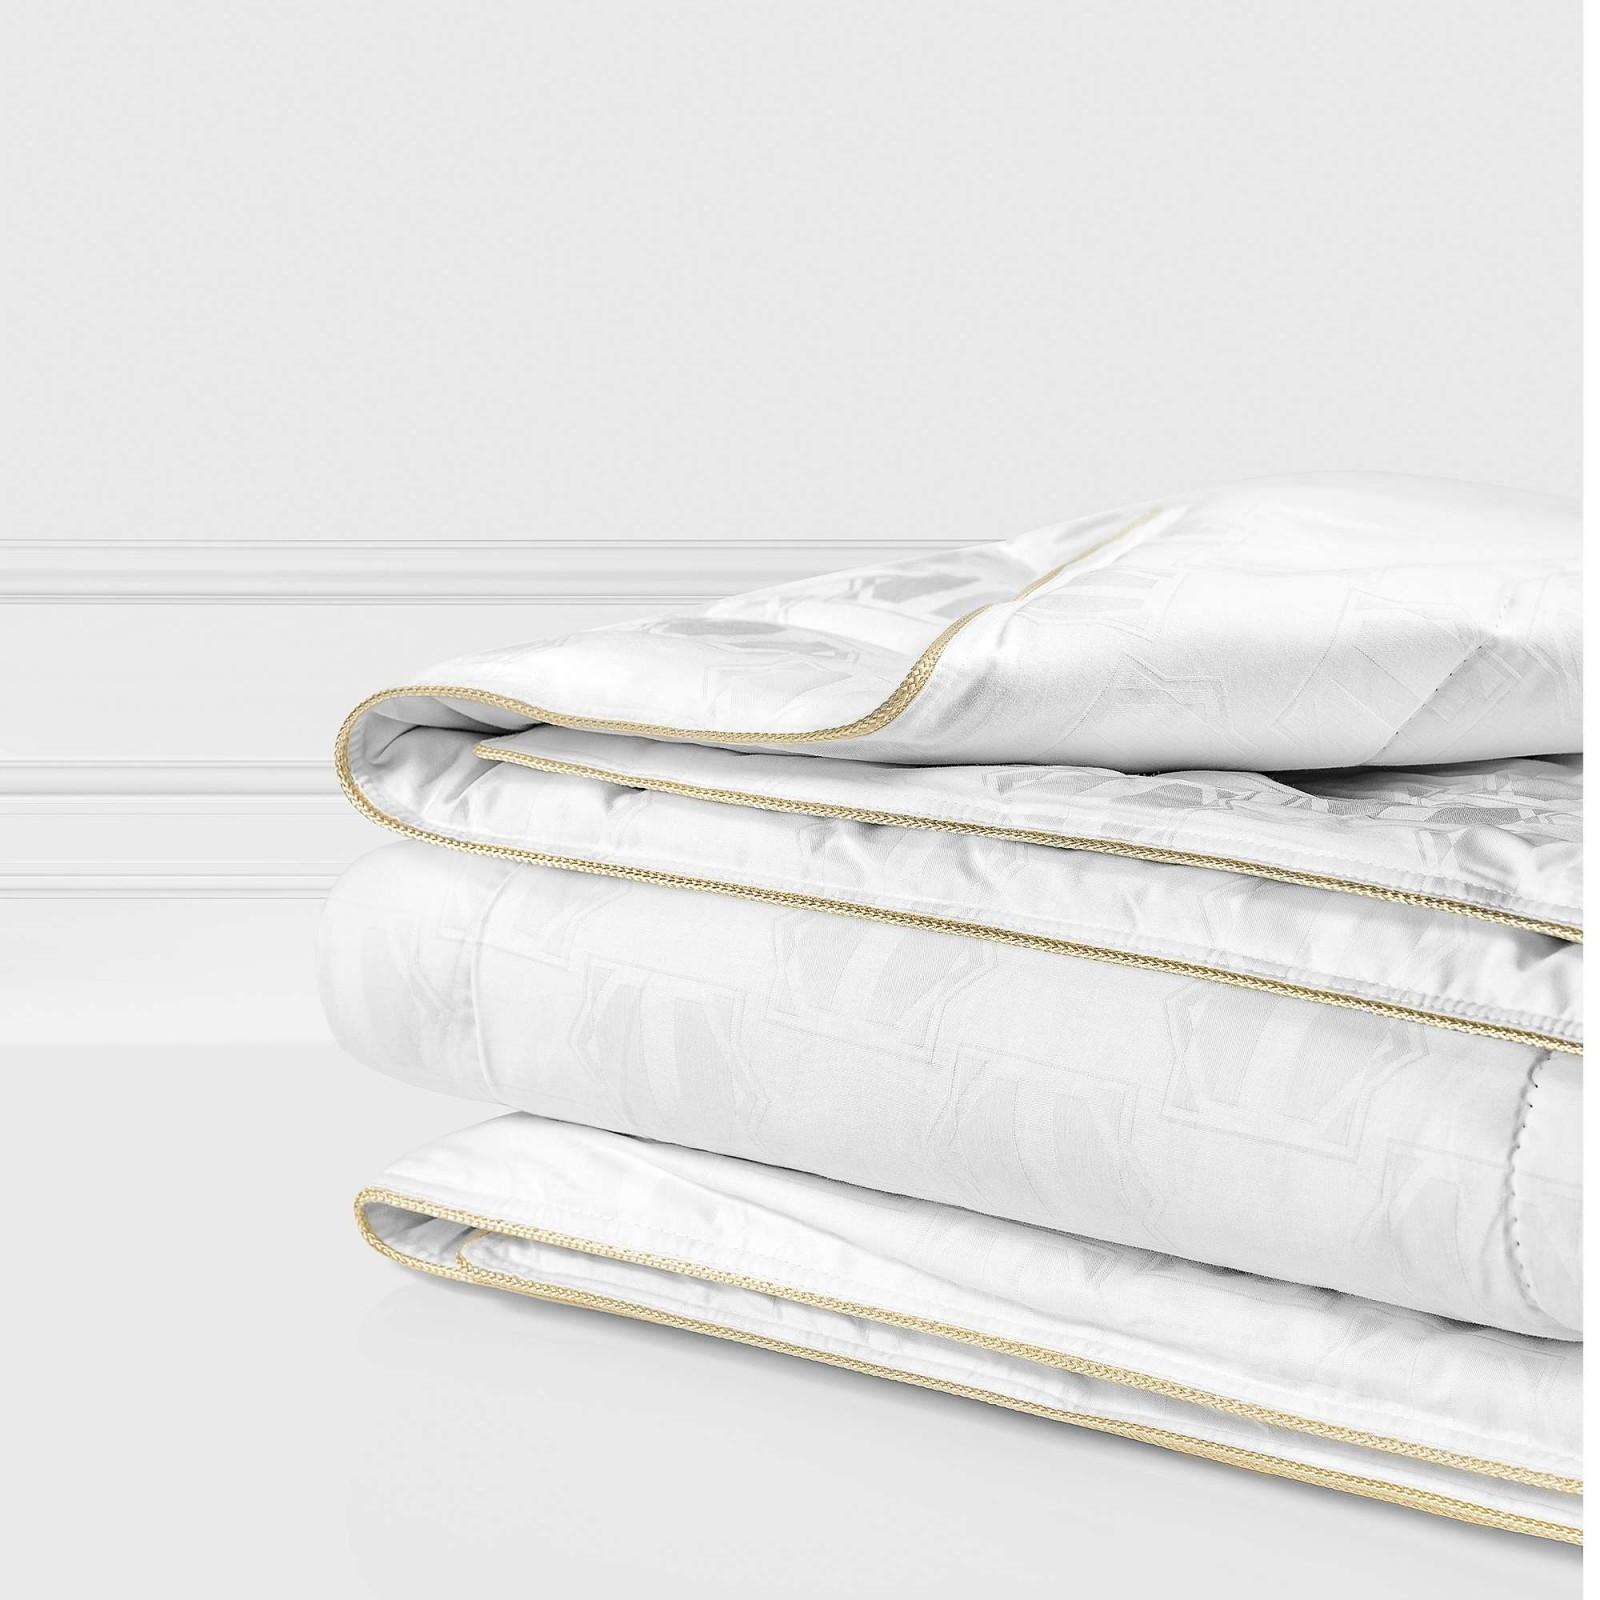 Одеяла Togas Одеяло Маэстро Всесезонное (140х200 см) одеяла togas одеяло гелиос 220х240 см